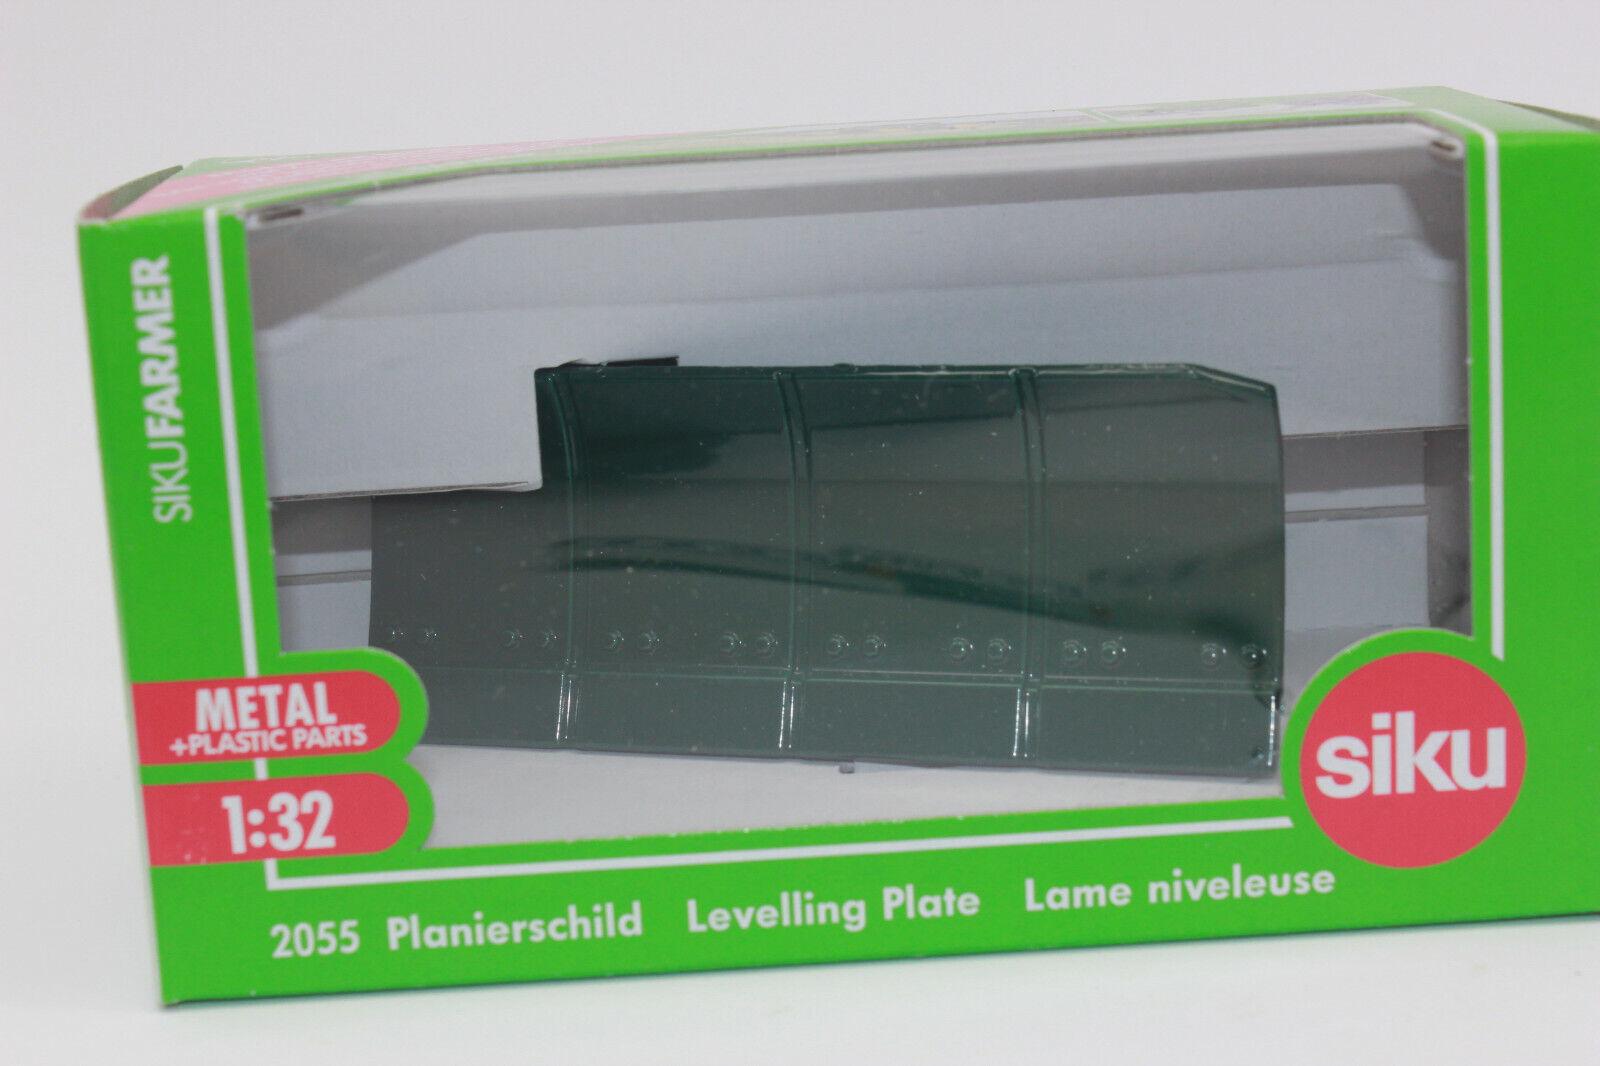 Zz Siku 2055 Lame Niveleuse green Mousse 1 3 2 Nouvelles en Emballage D'Origine